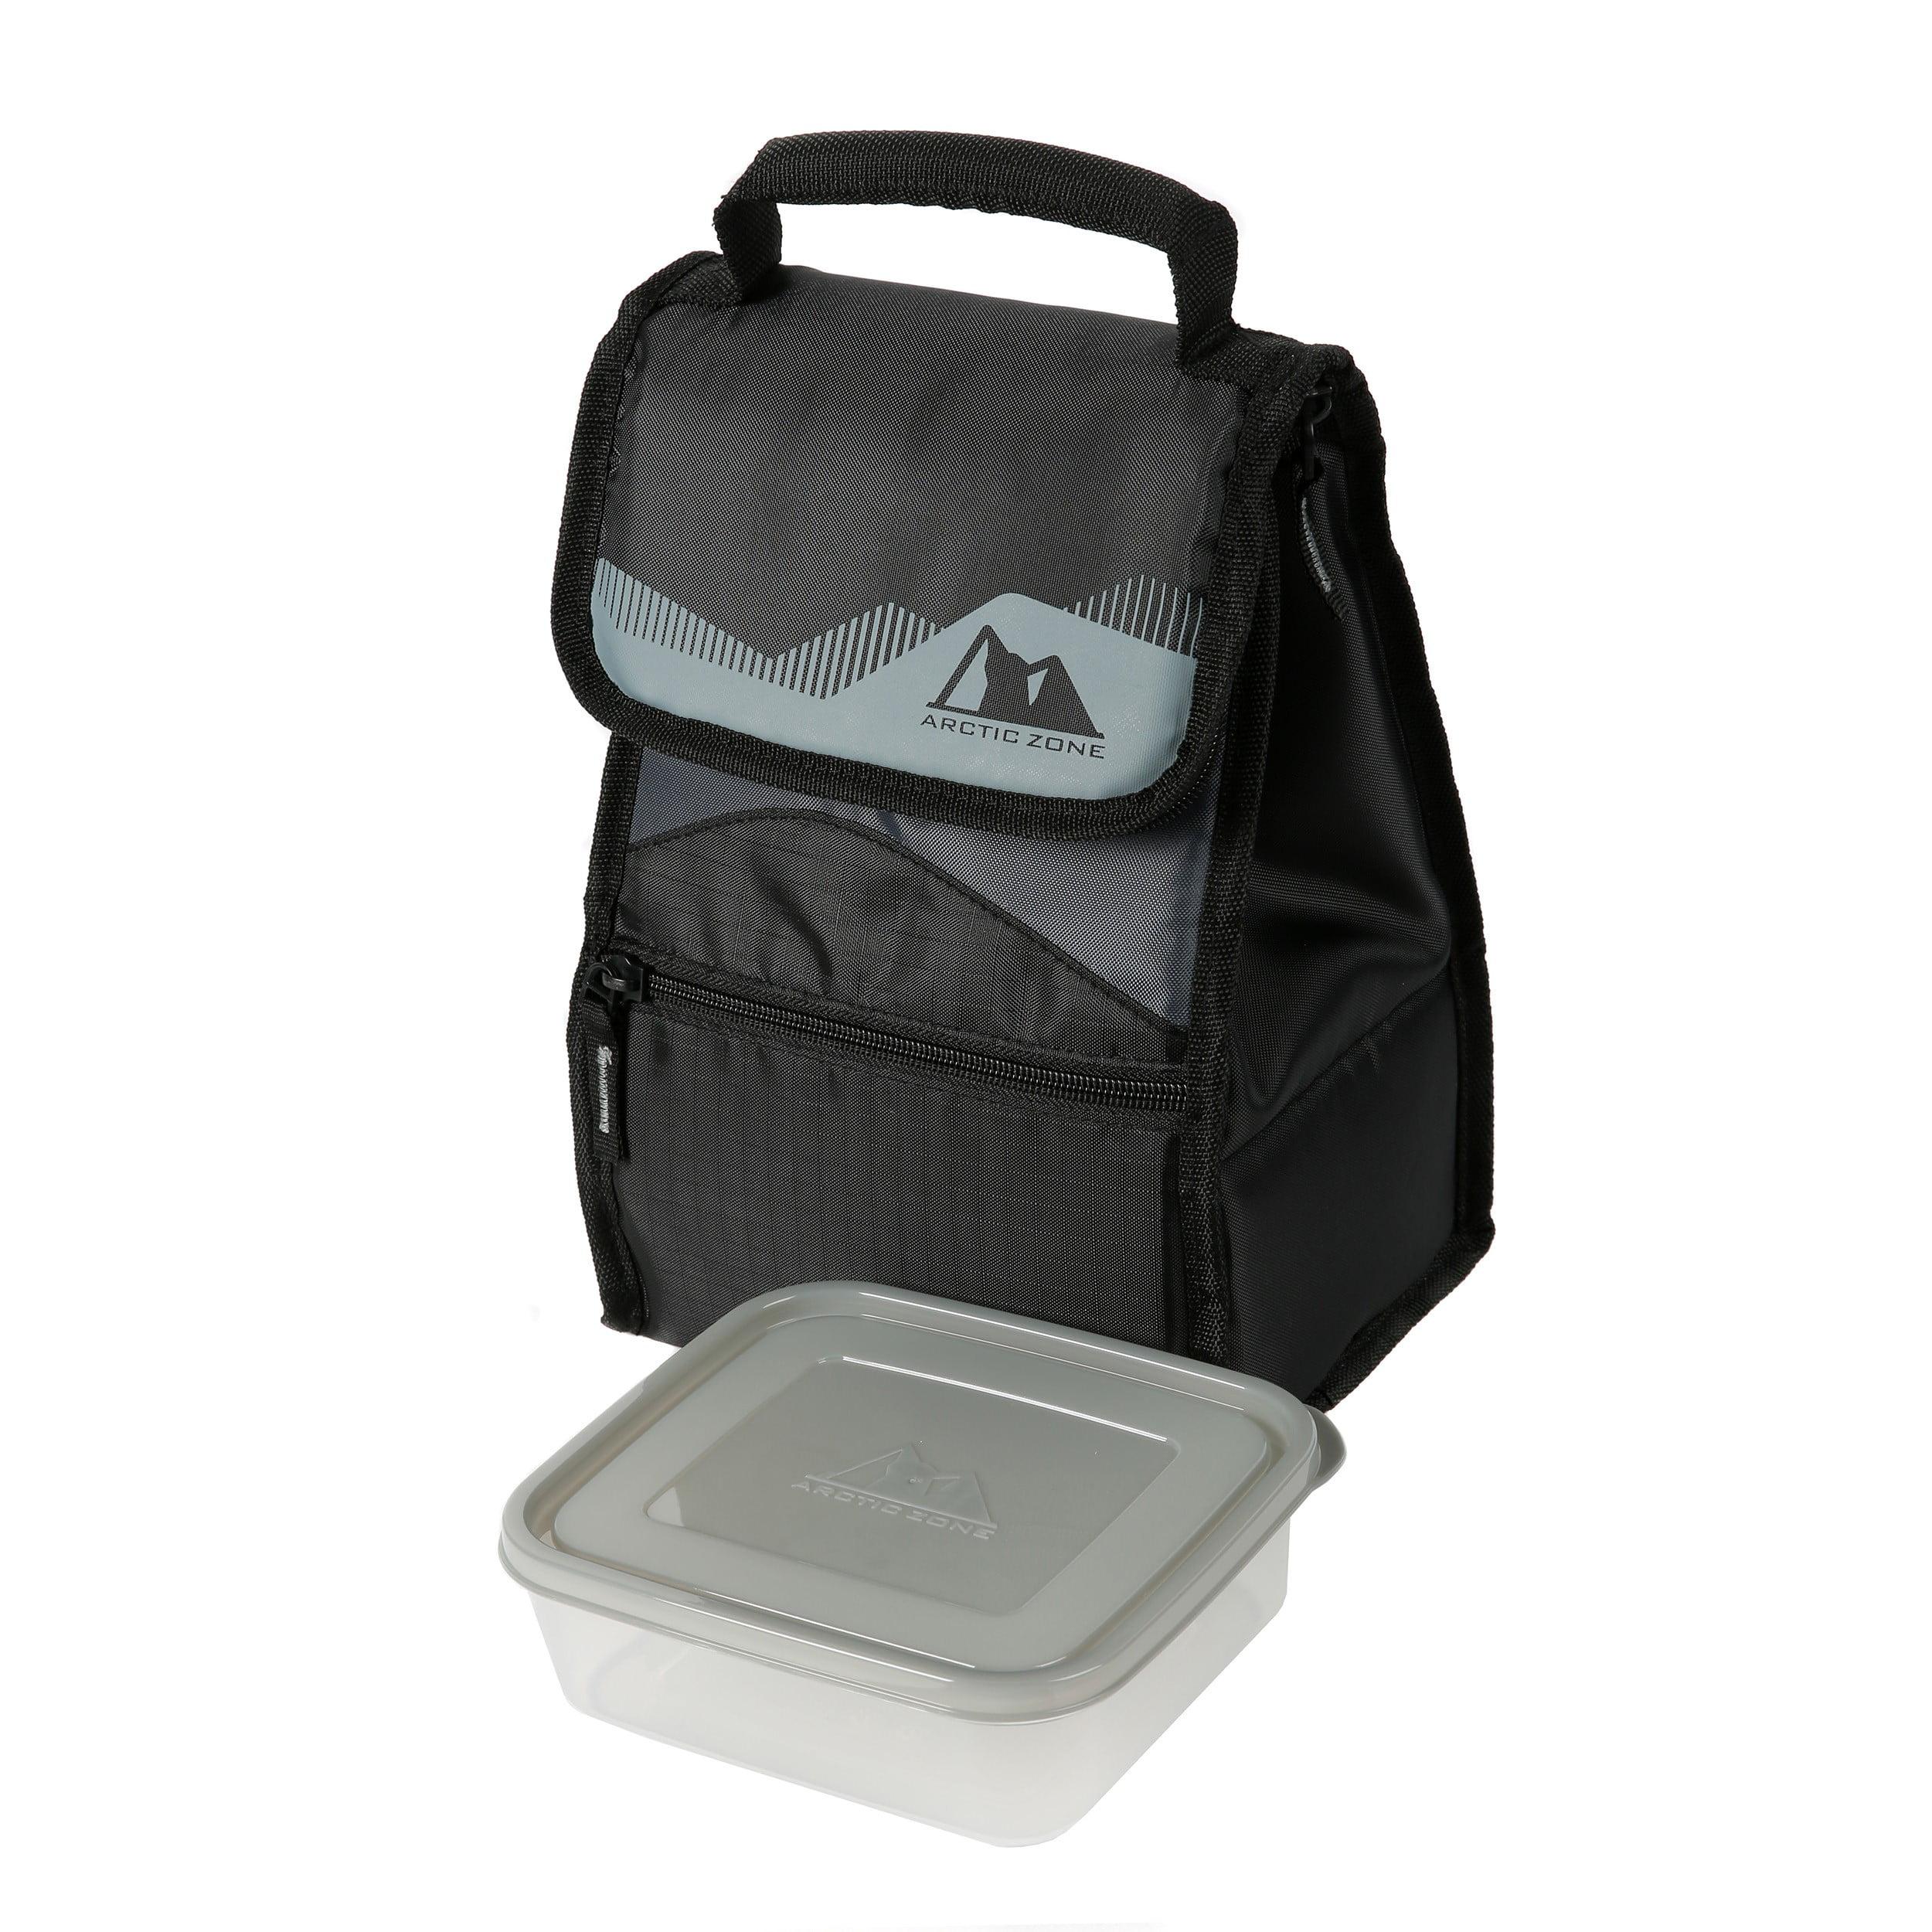 Arctic Zone Hi-Top Power Pack Lunch Bag